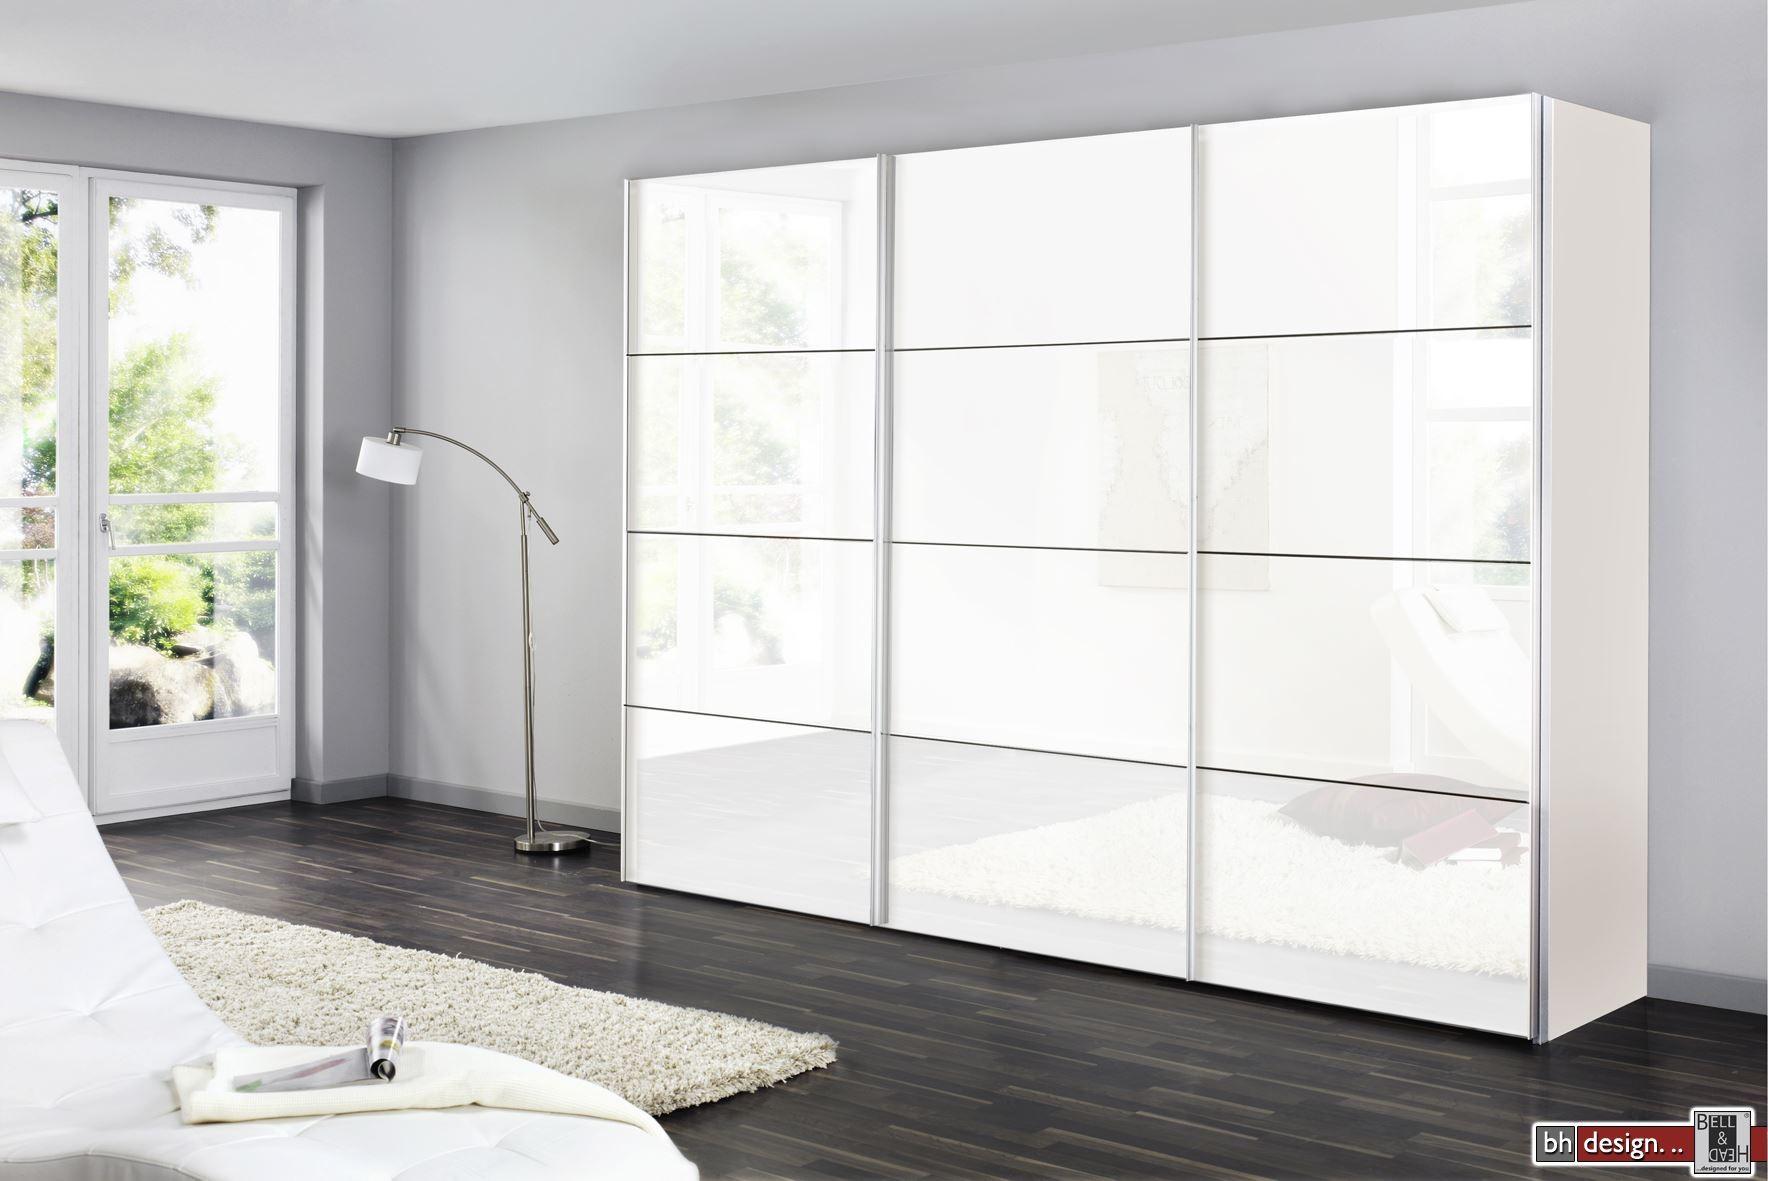 express m bel schwebet renschrank four you lackfront weiss 150 cm bis 300 cm h he 216 cm. Black Bedroom Furniture Sets. Home Design Ideas